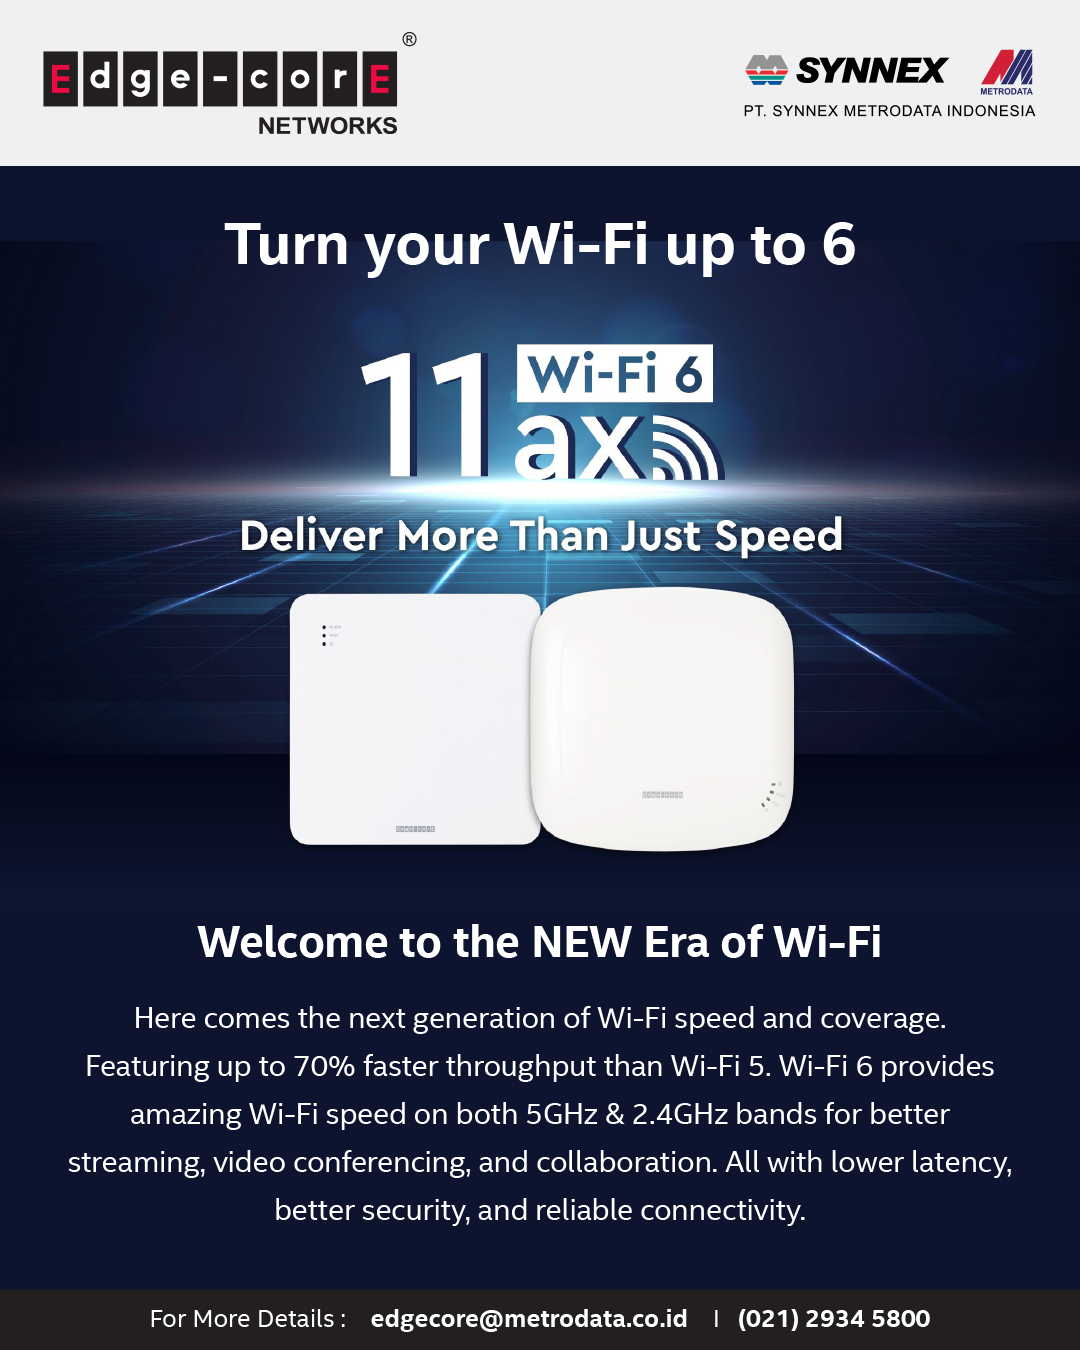 https://www.synnexmetrodata.com/wp-content/uploads/2021/07/EDM-Edgecore-Networks-Turn-your-Wi-Fi-up-to-6-1080-x-1350-pixel-1.jpg